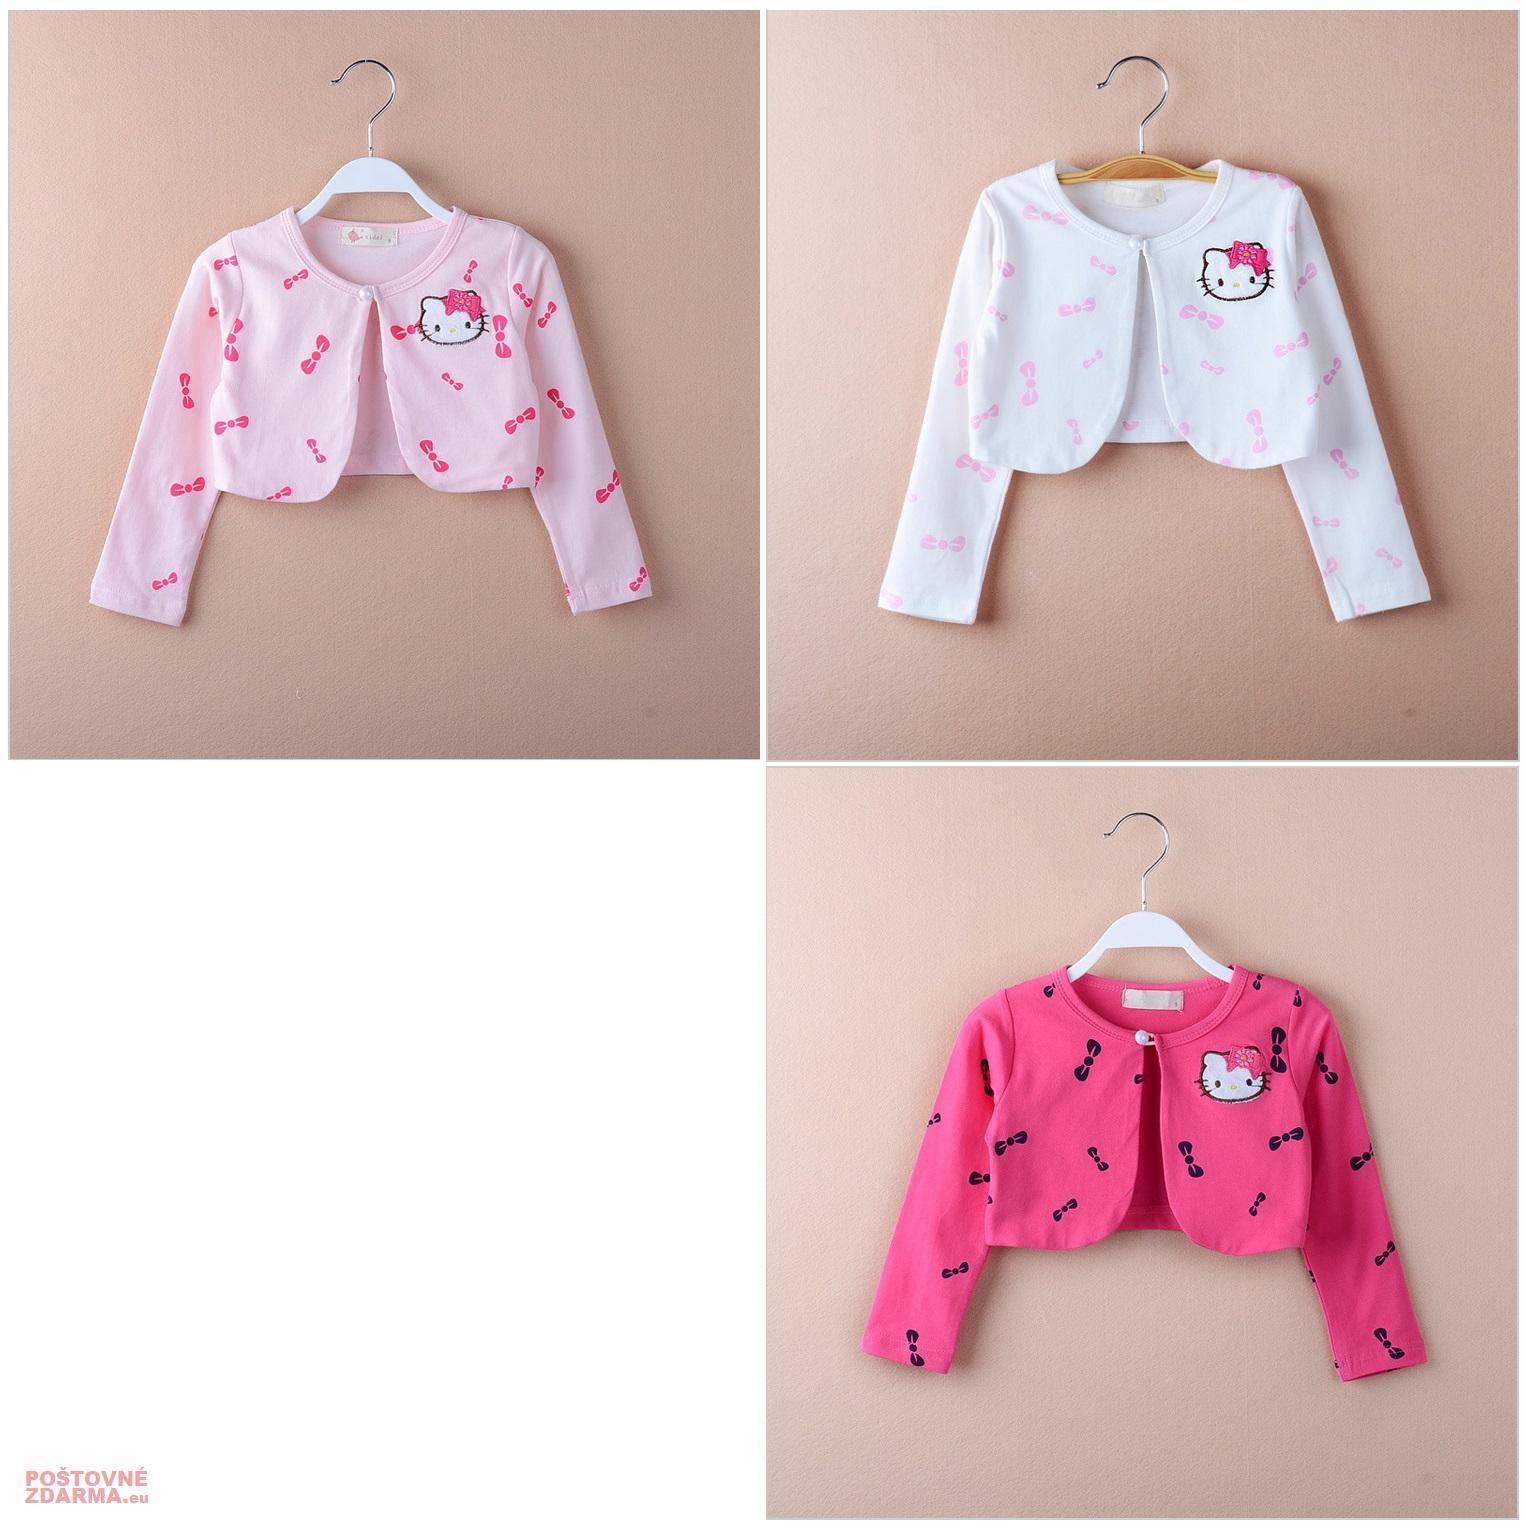 Dětský svetřík - Hello Kitty / dnk-13-01250